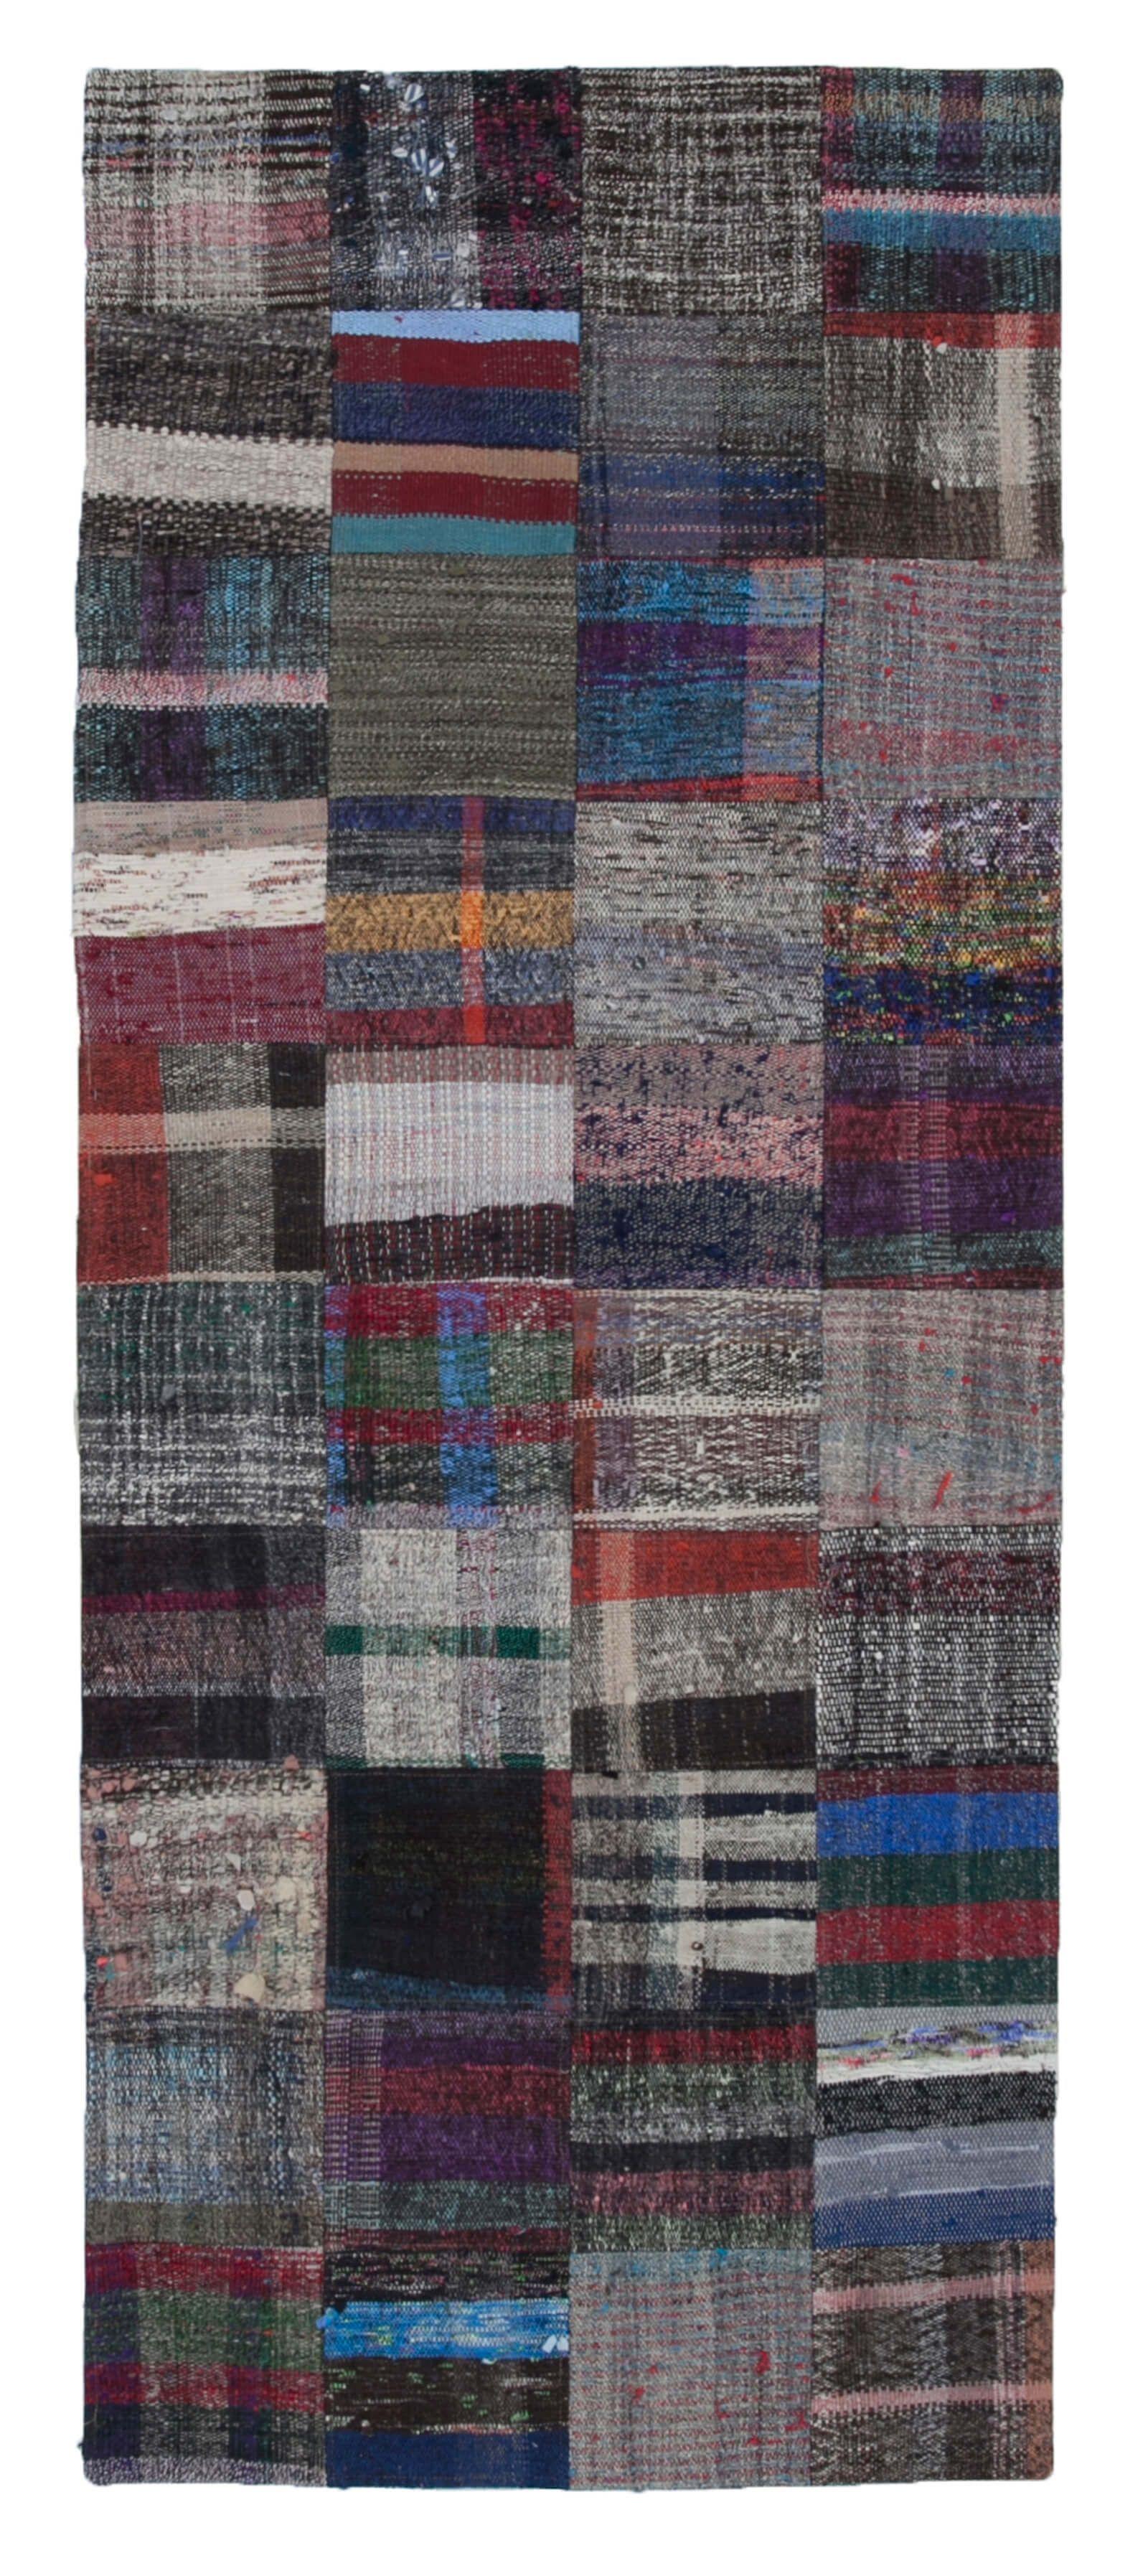 3x8 Multicolor Kilim Patchwork Rug 8157 Patchwork Rugs Handmade Kilim Vintage Area Rugs